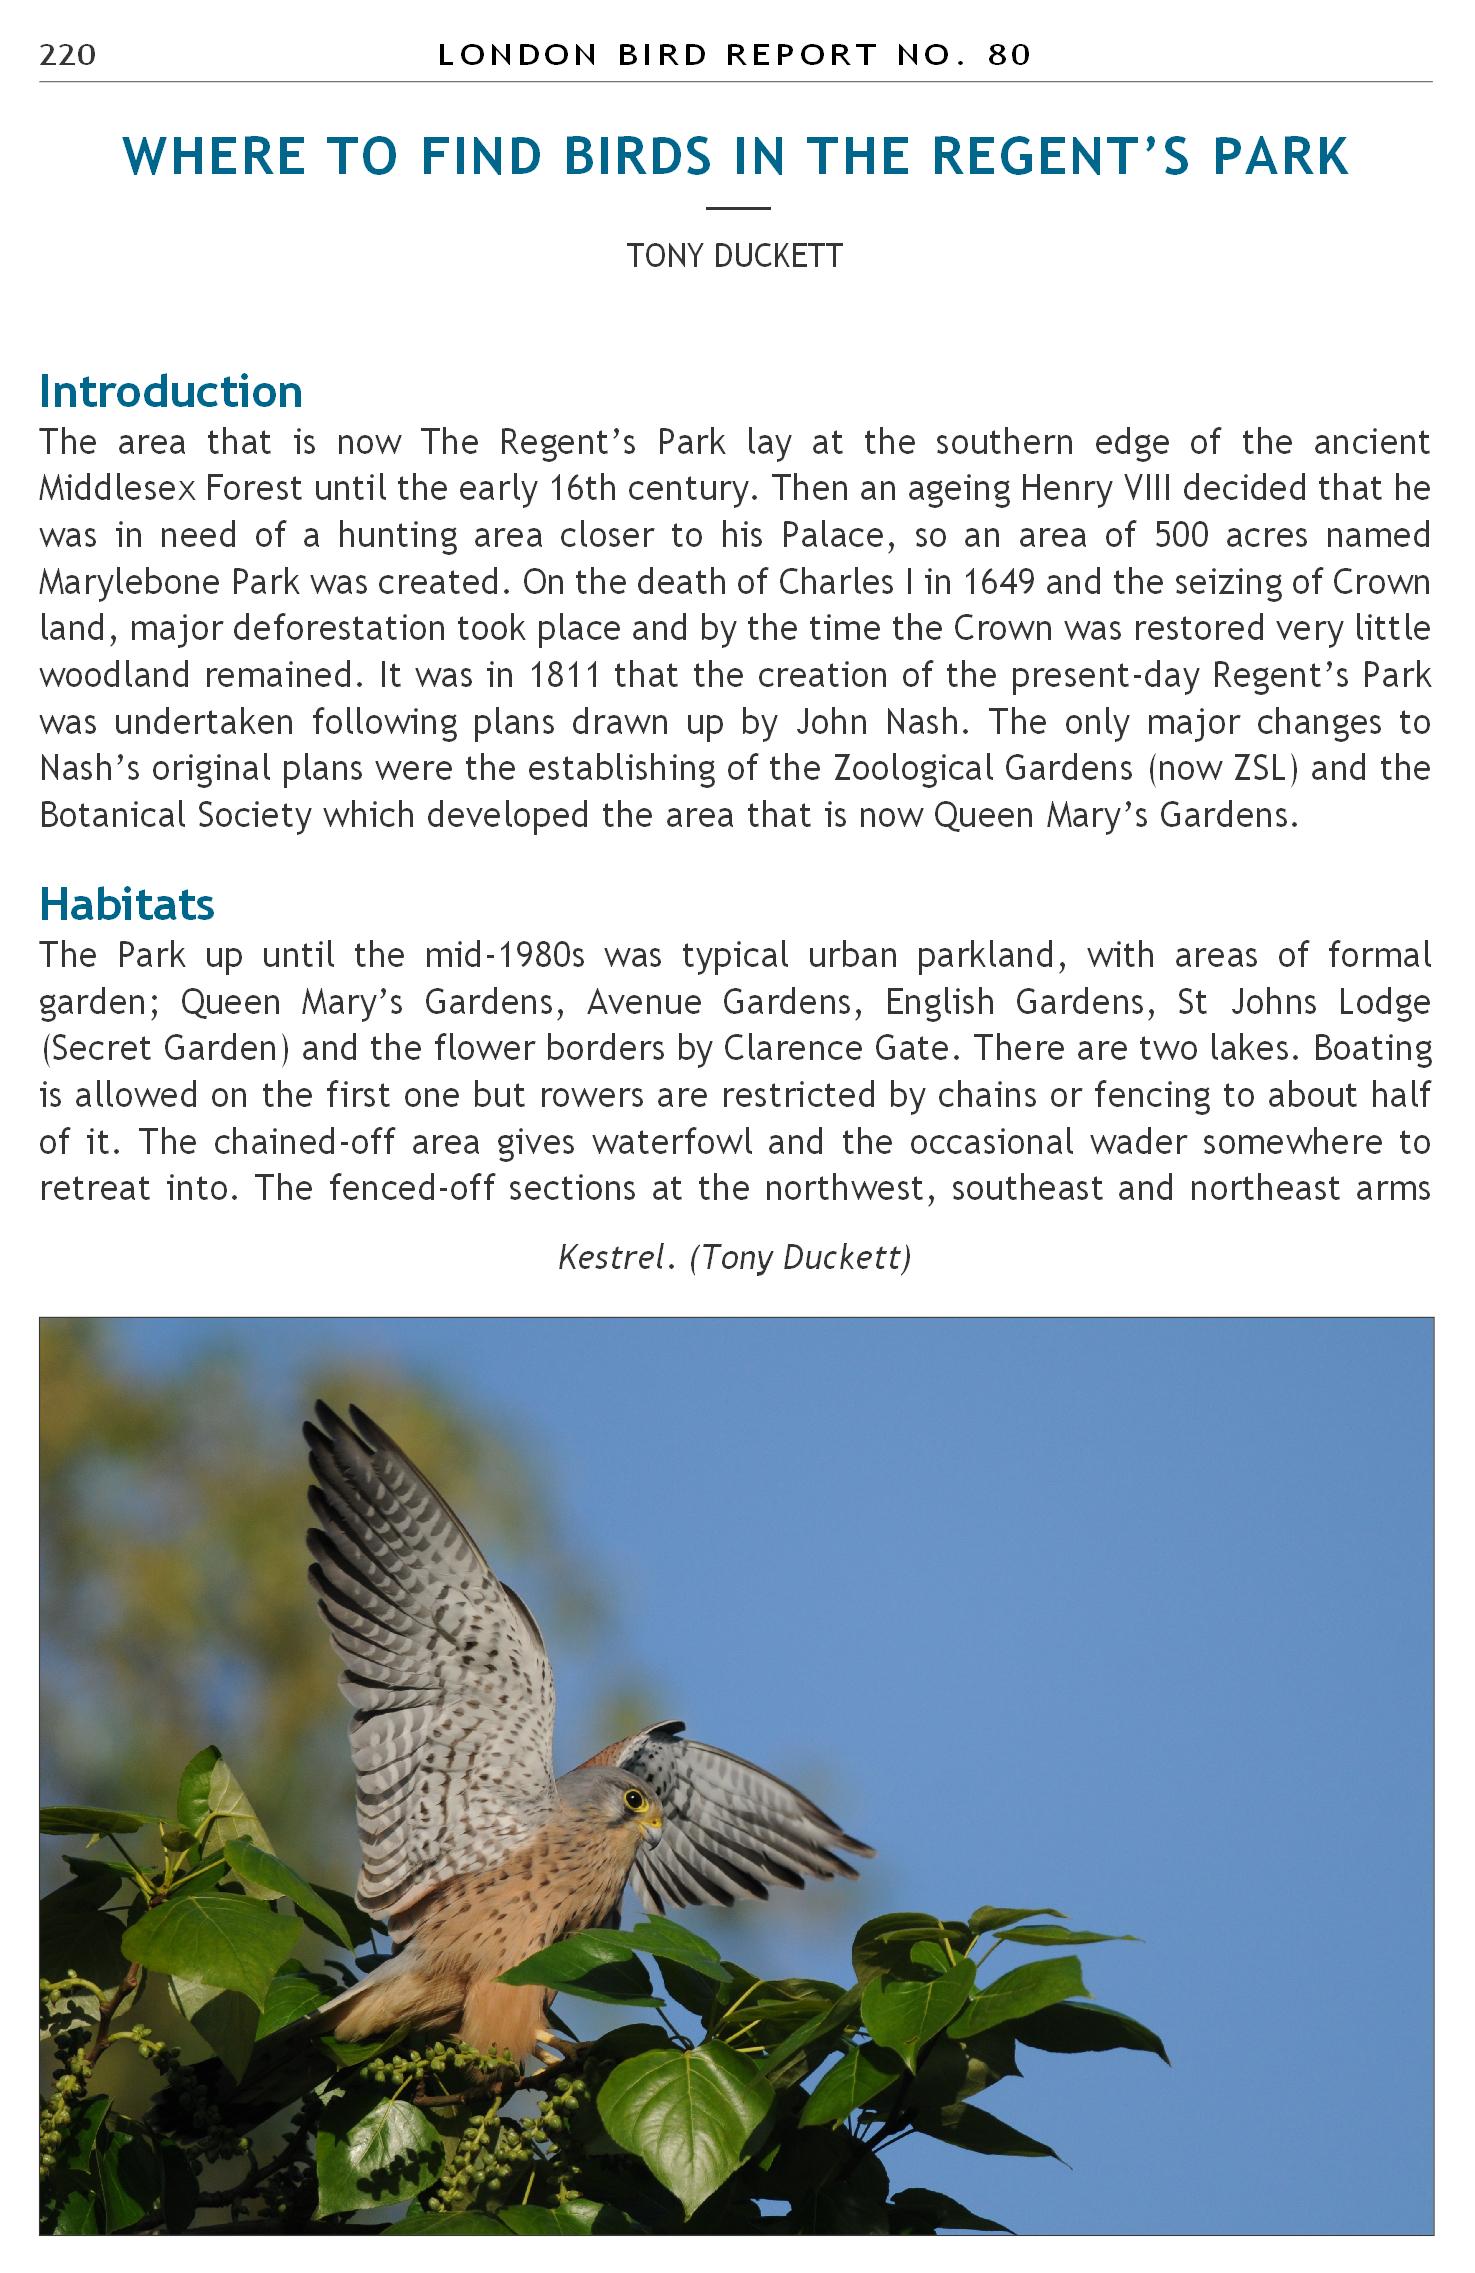 British Bird List Spreadsheet Within London Natural History Society  Home